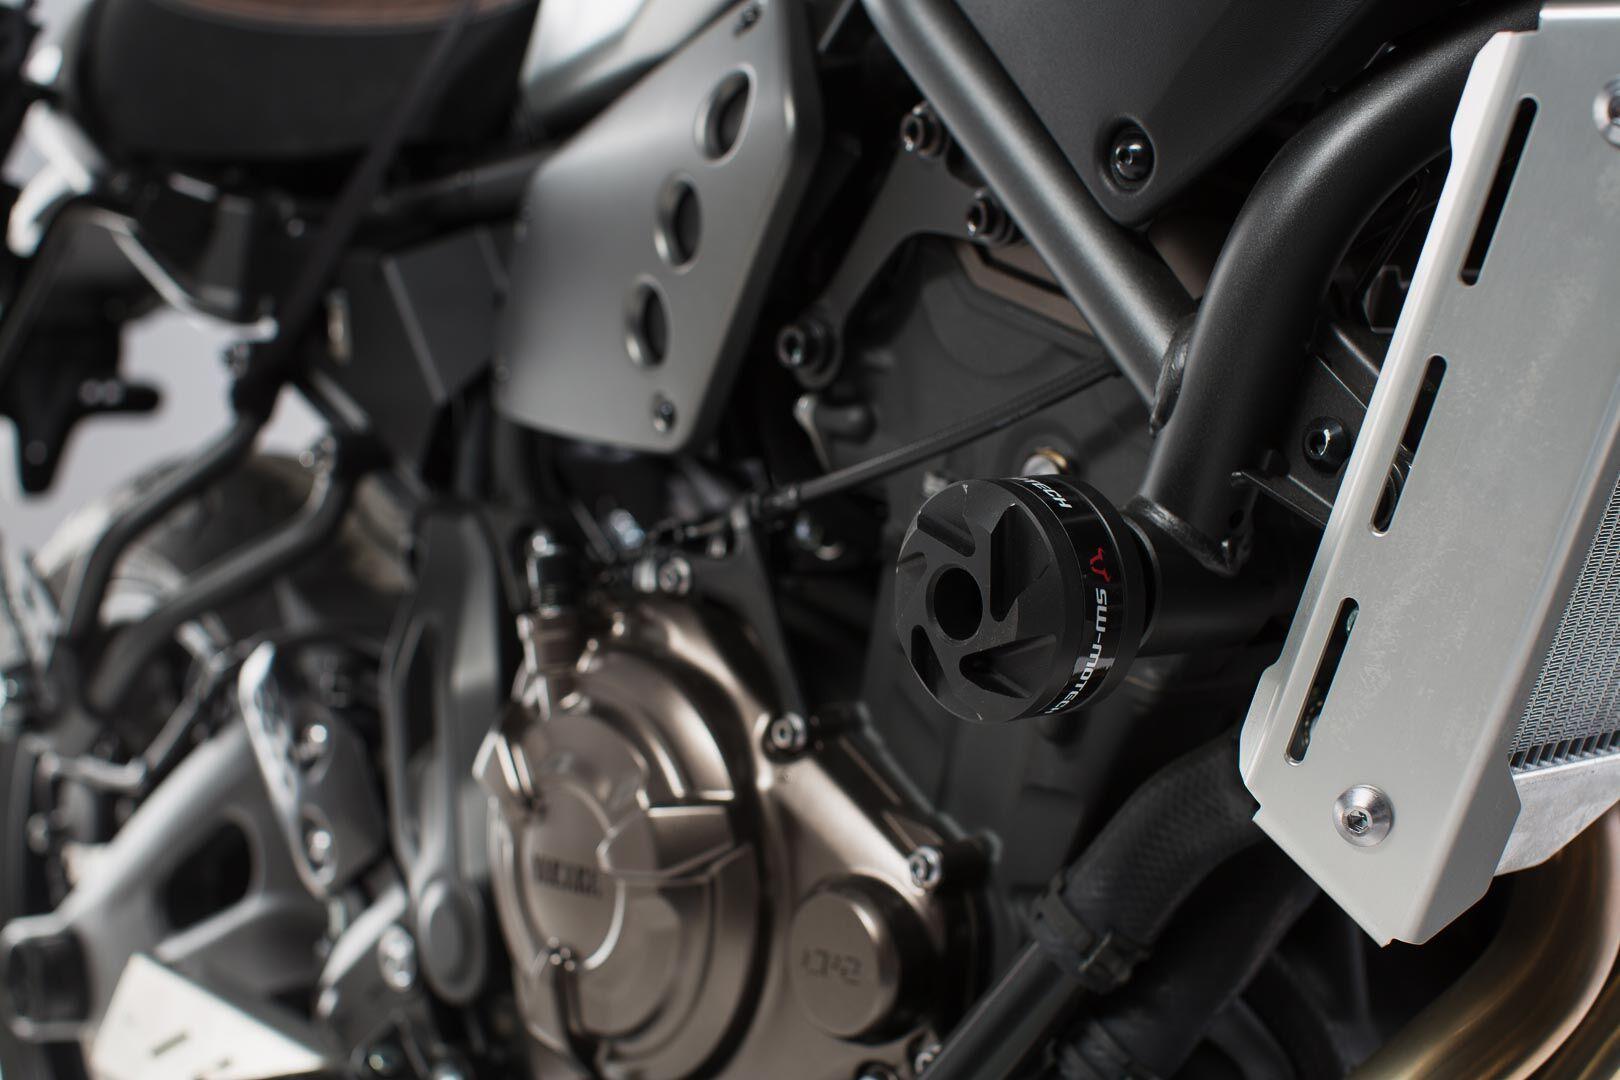 SW-Motech Kit de protectores anticaídas - Negro. Yamaha XSR 700 (16-).